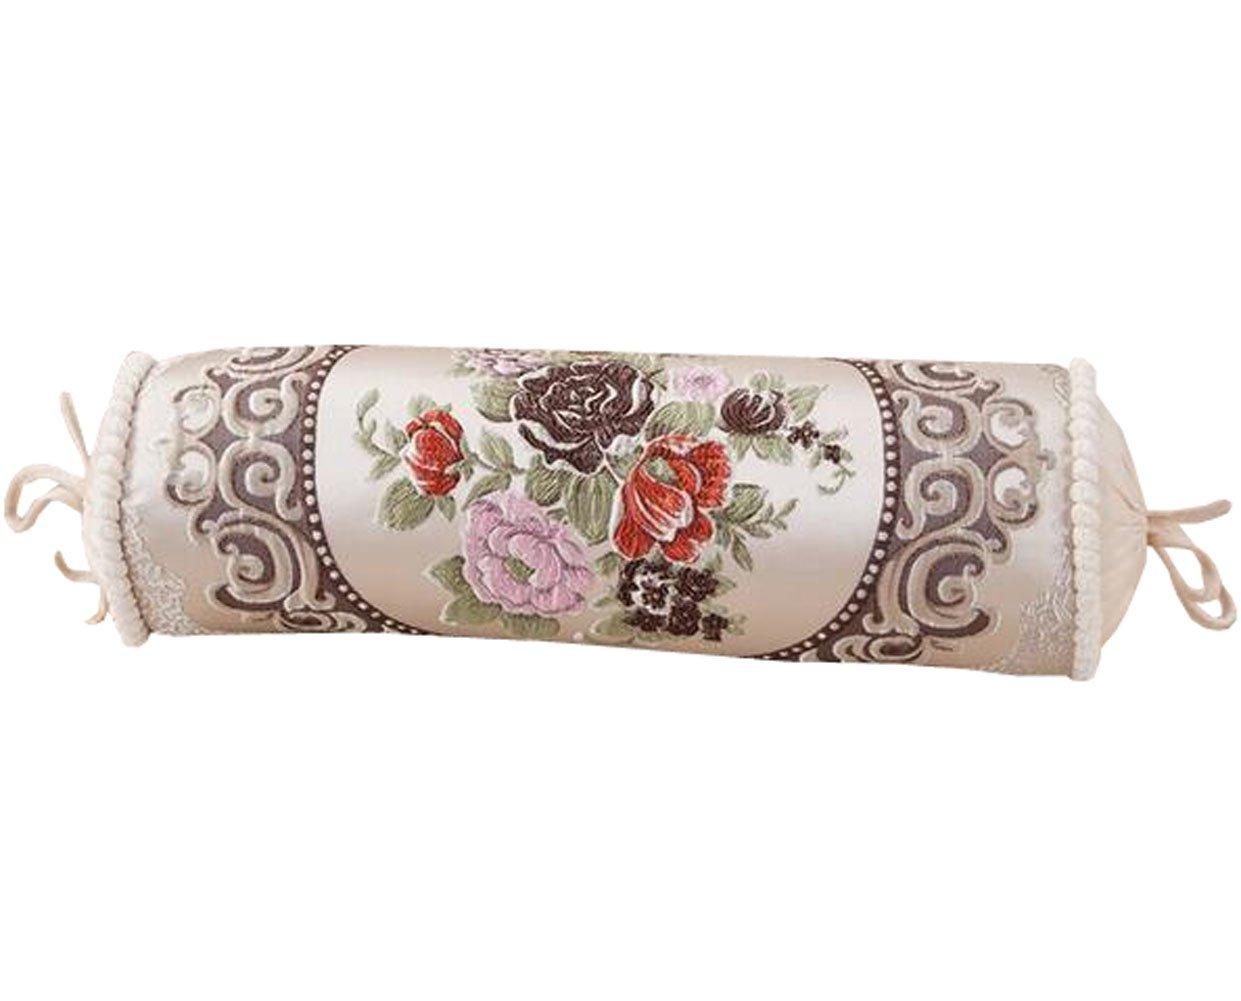 mytodoラウンド円柱Washableスロークッション枕装飾枕 Free size ベージュ MYtodo-23 B075TWZ6Z2 ベージュ